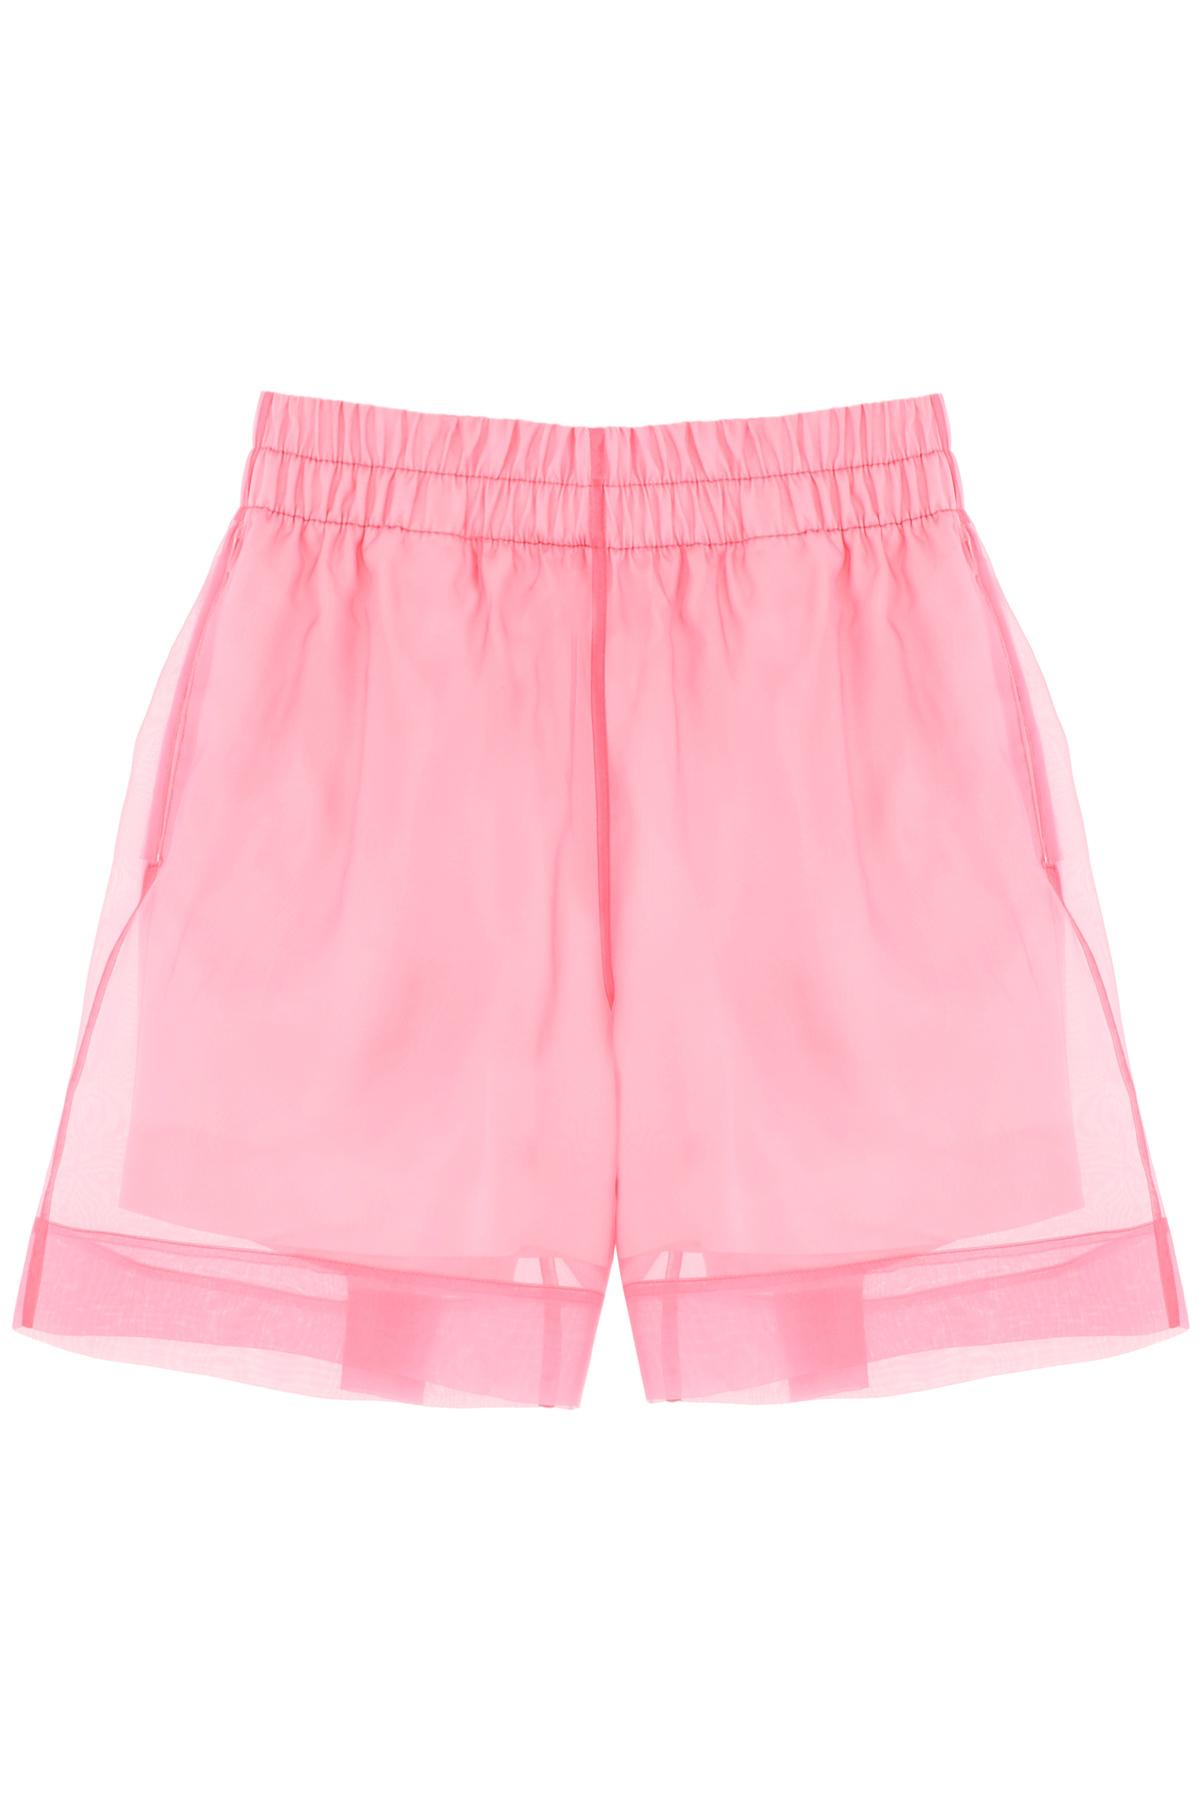 Dries van noten shorts in organza di seta